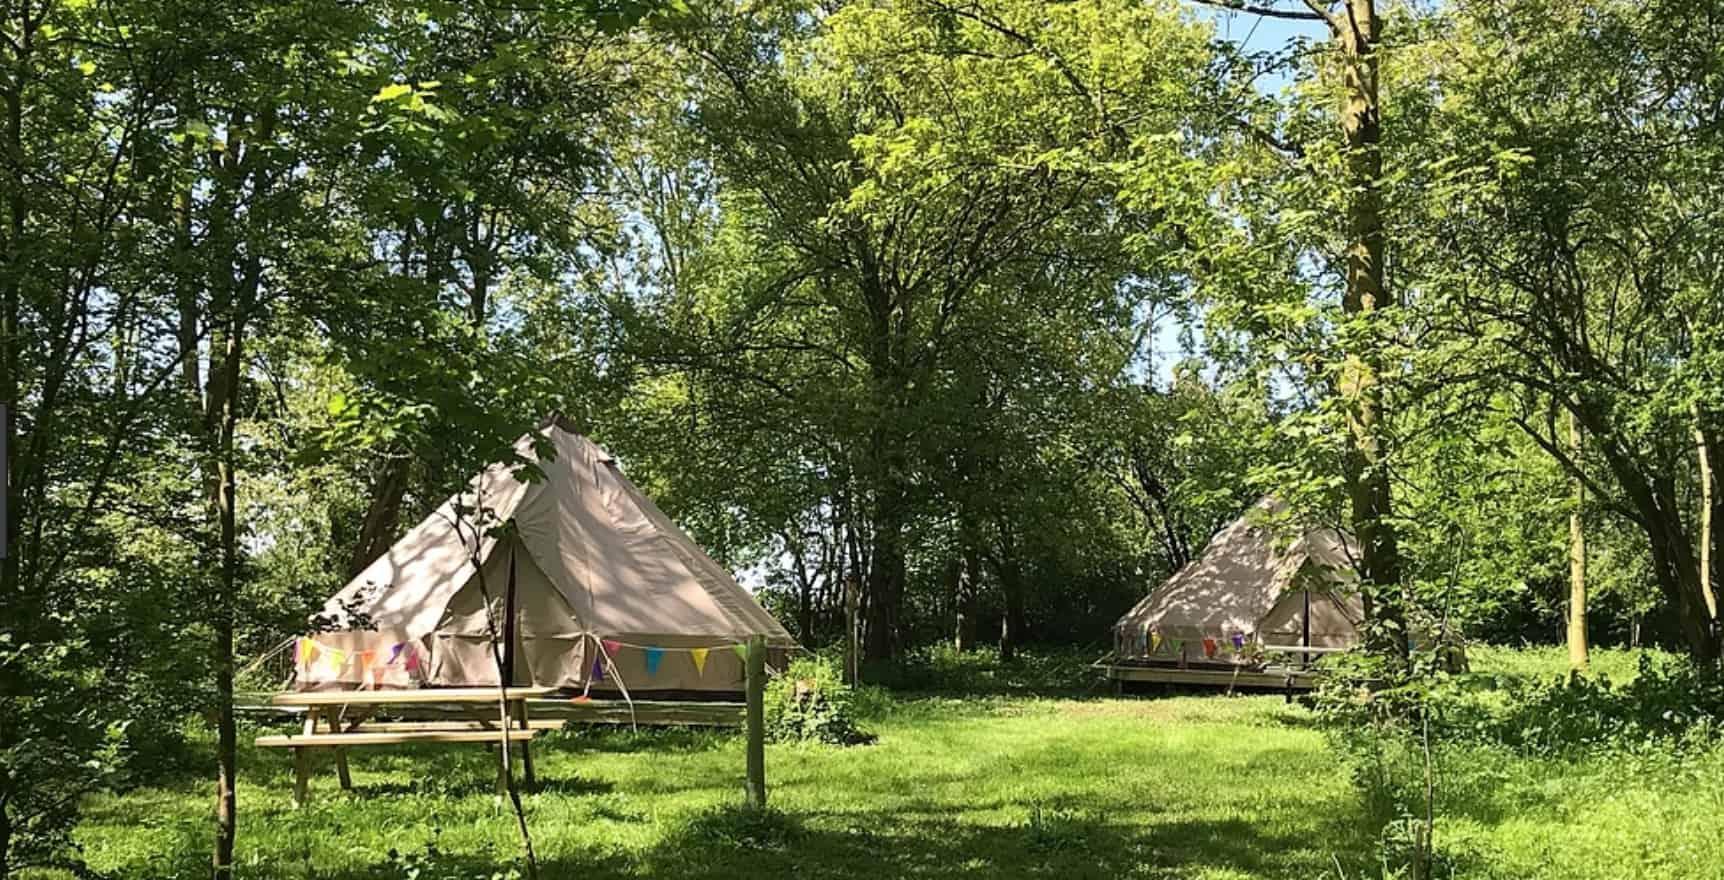 A bell tent hidden in the woods